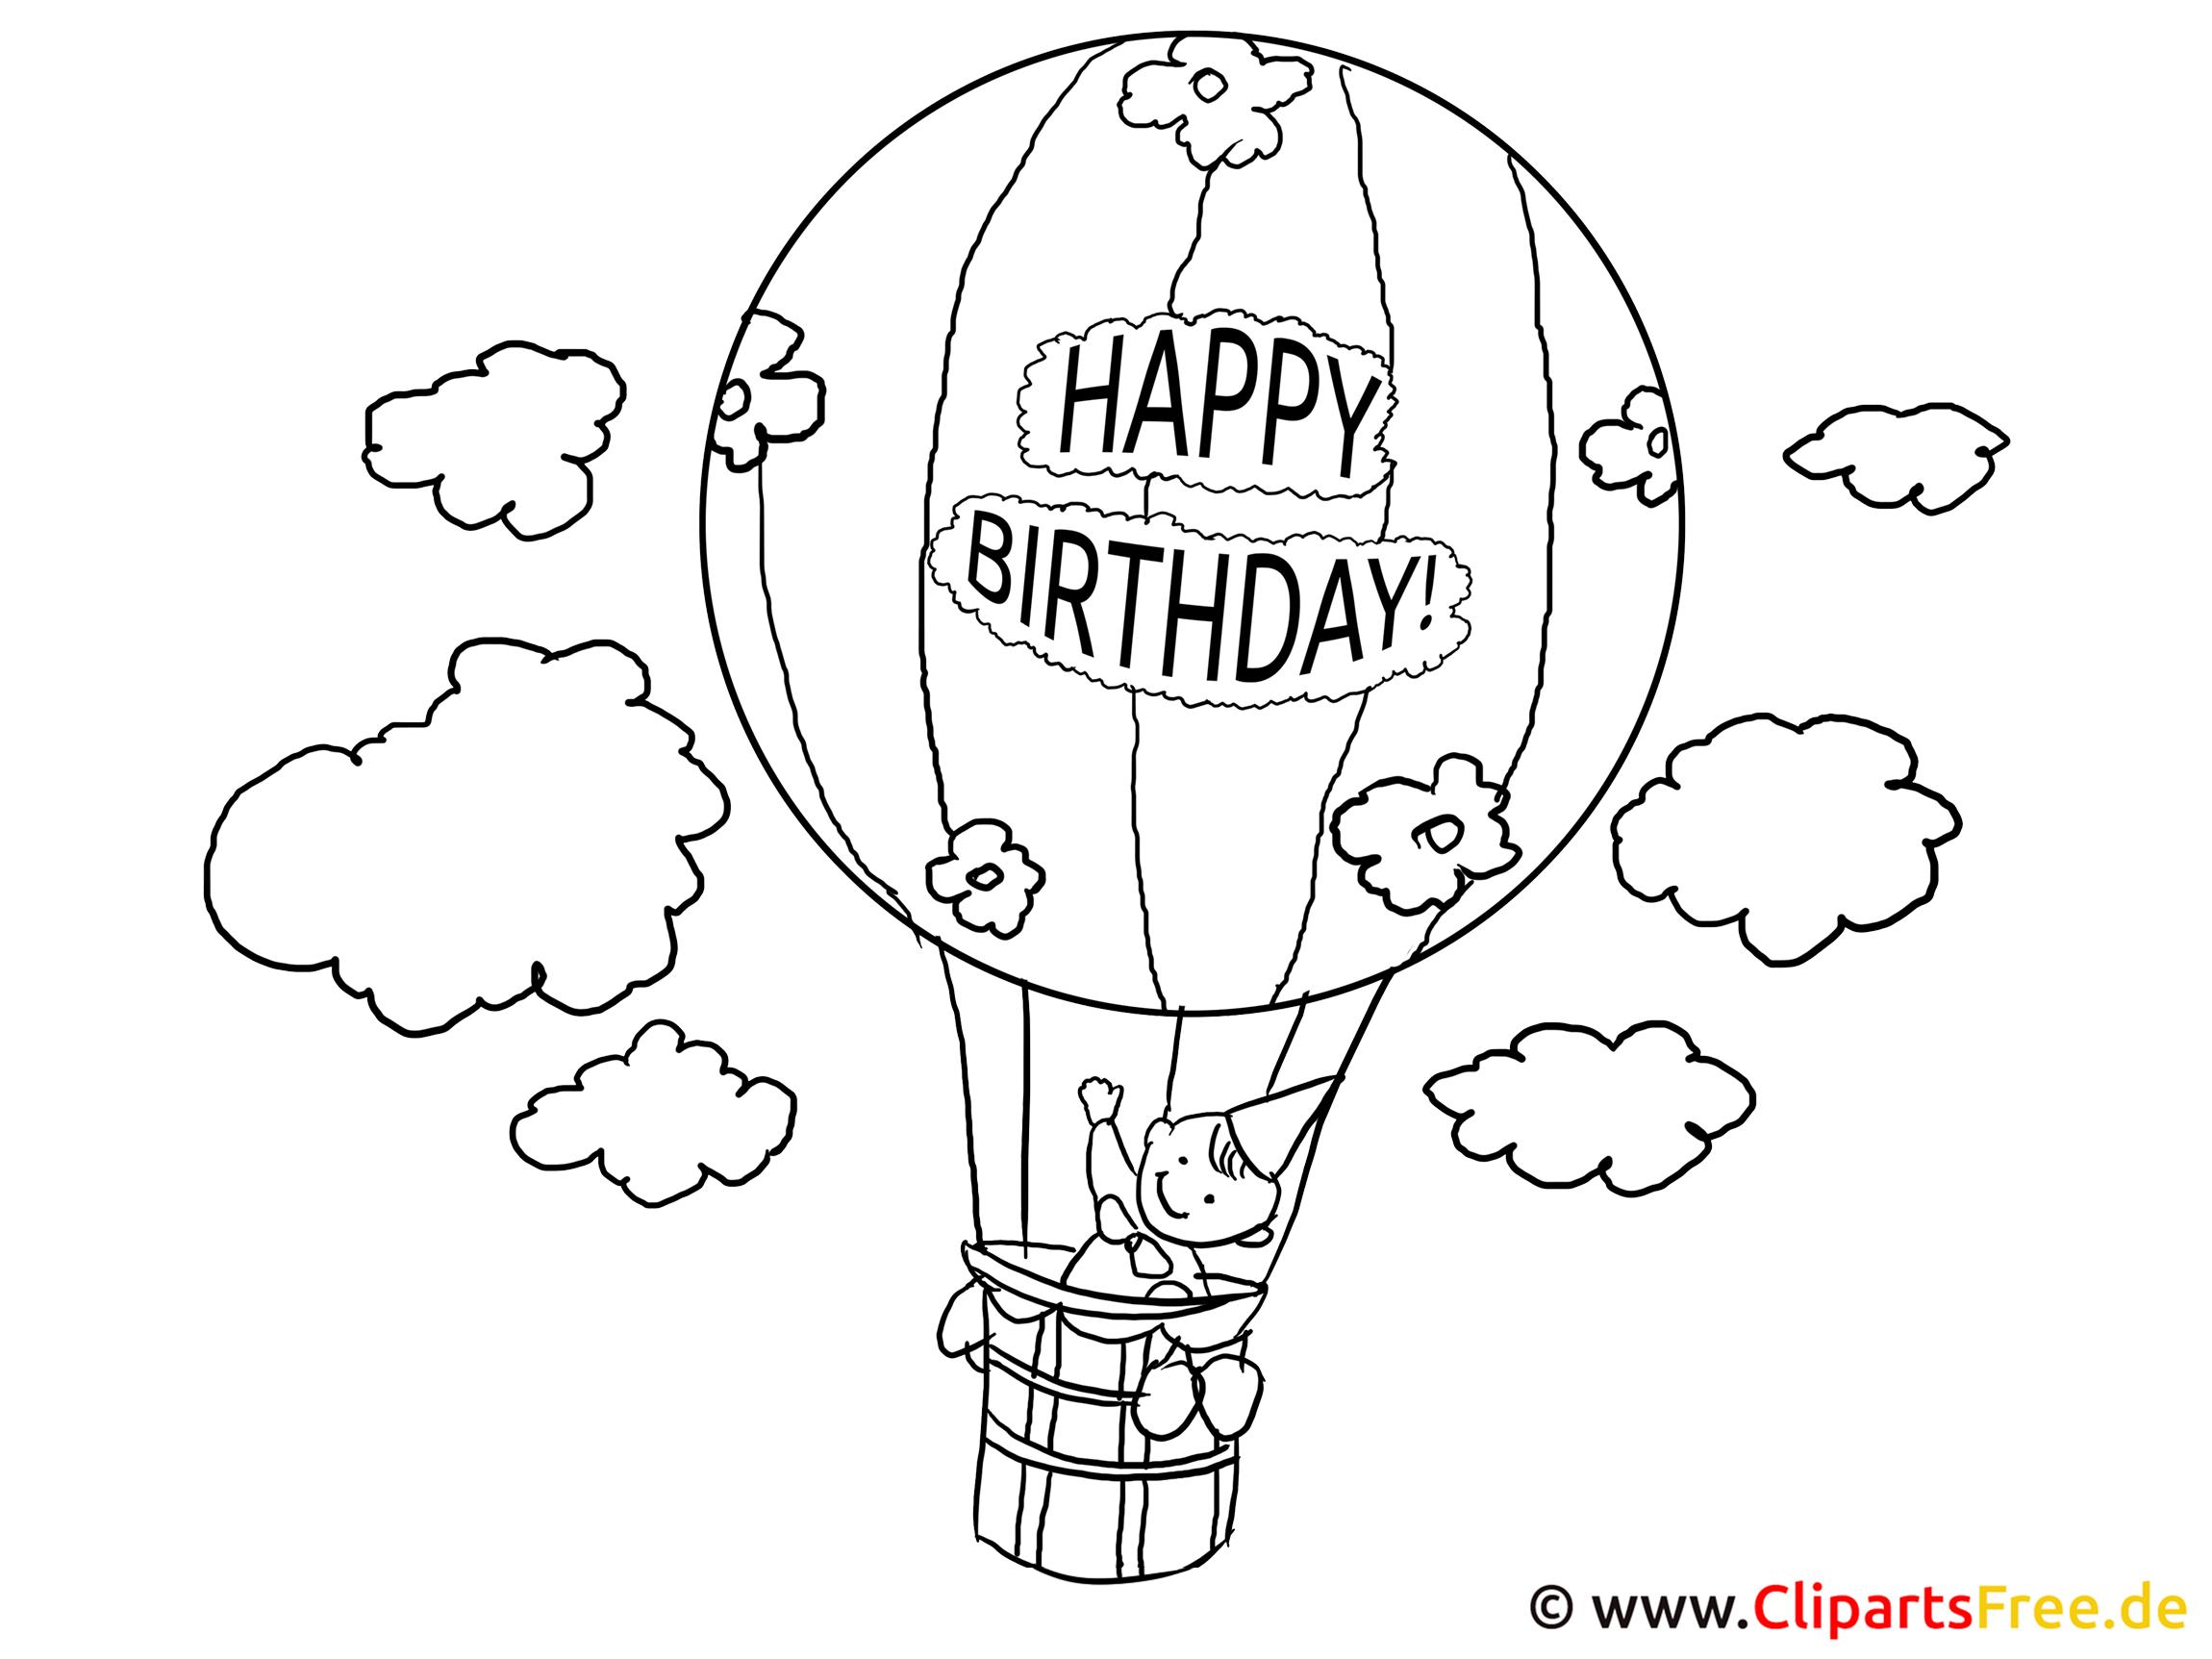 luftballons zum ausmalen